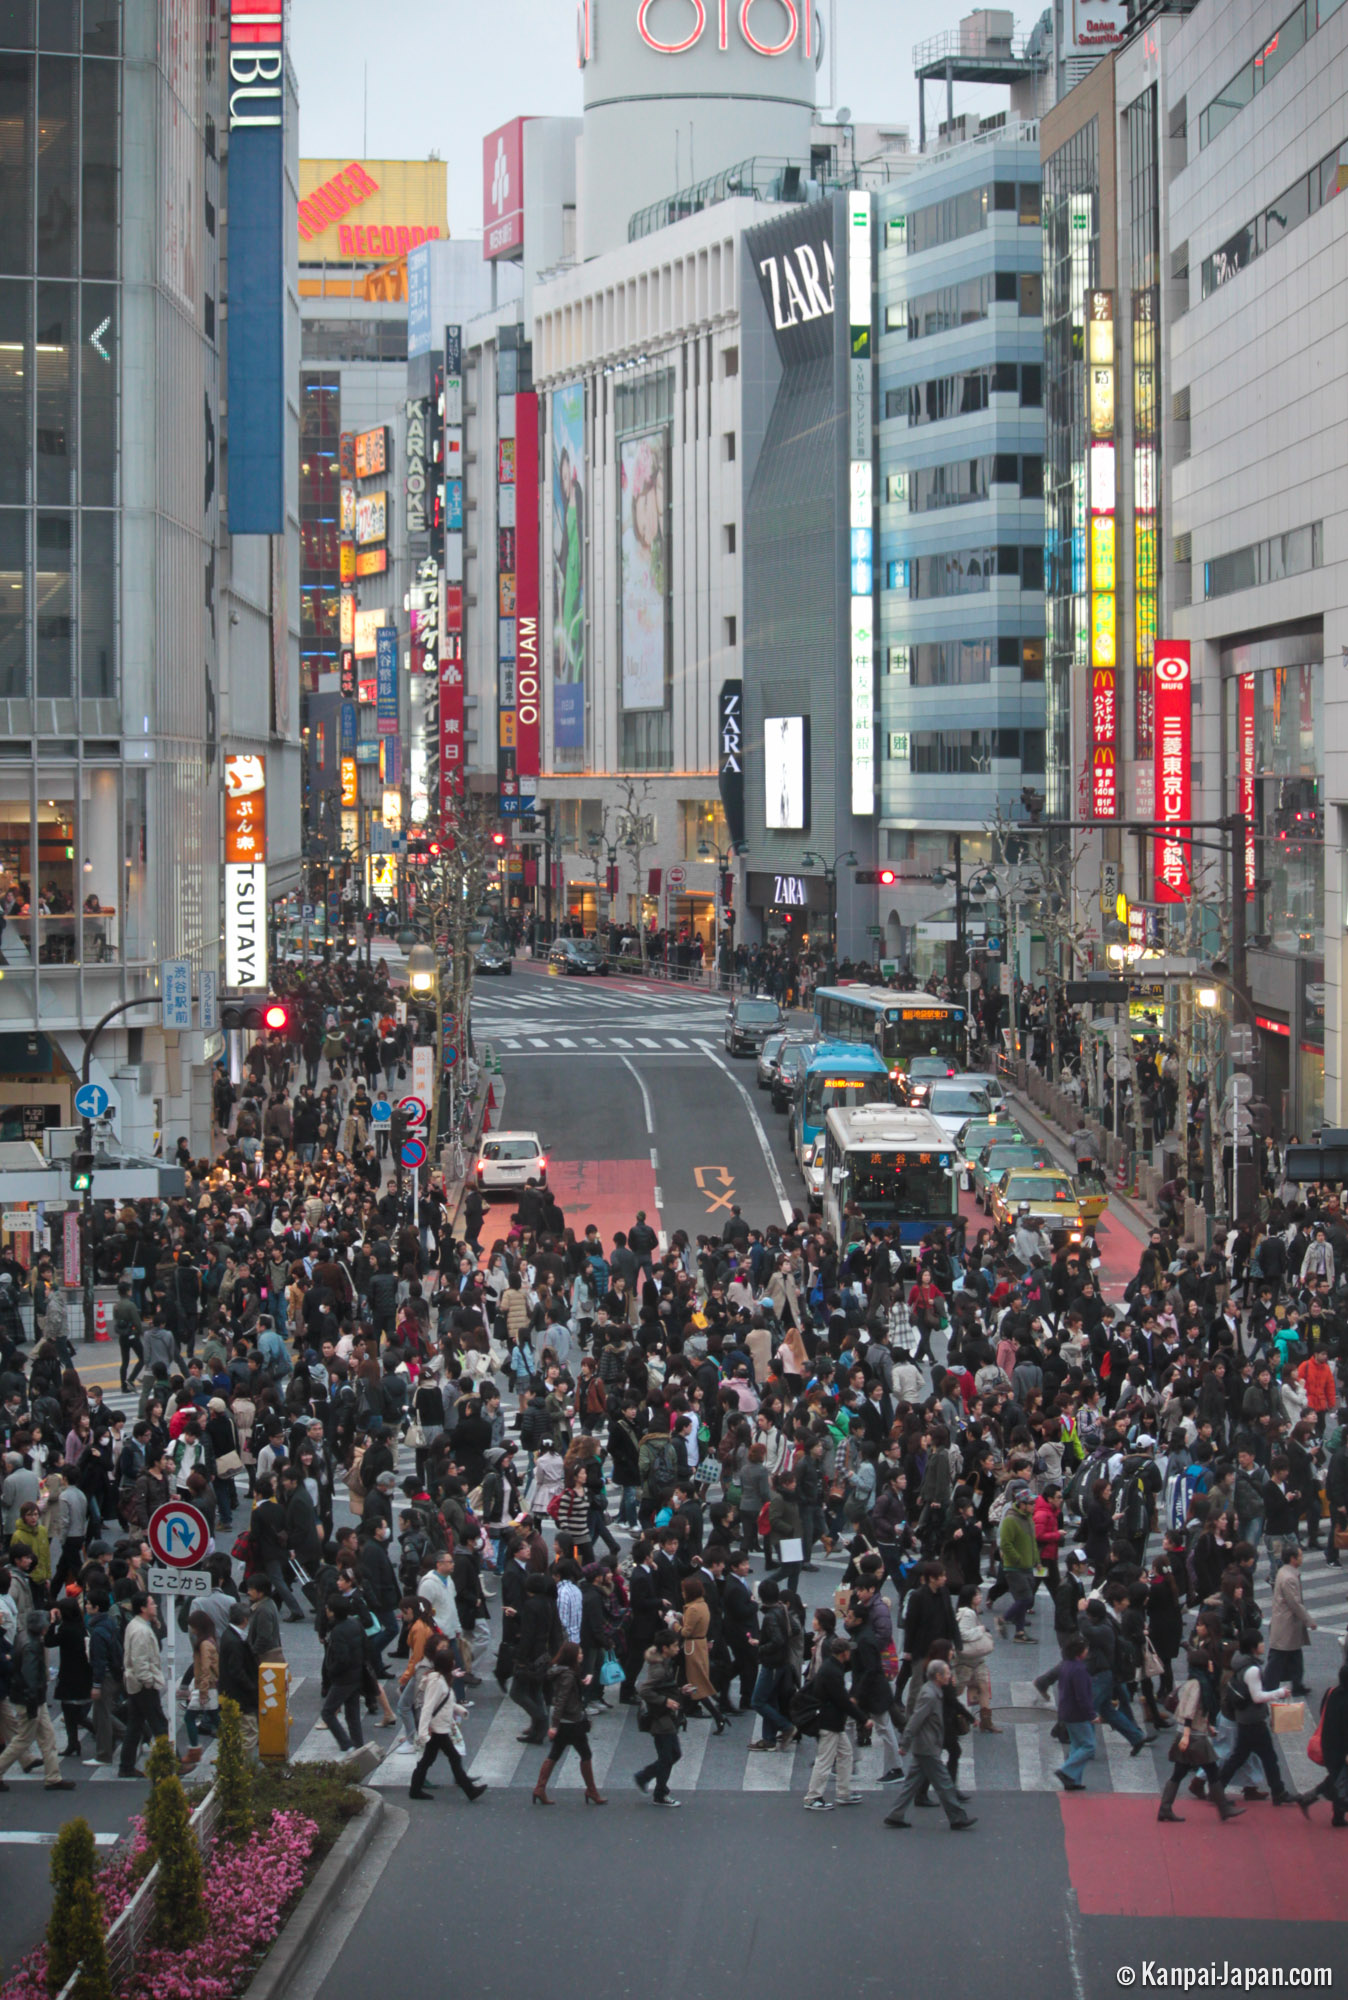 Shibuya Crossing - The biggest scramble in the world